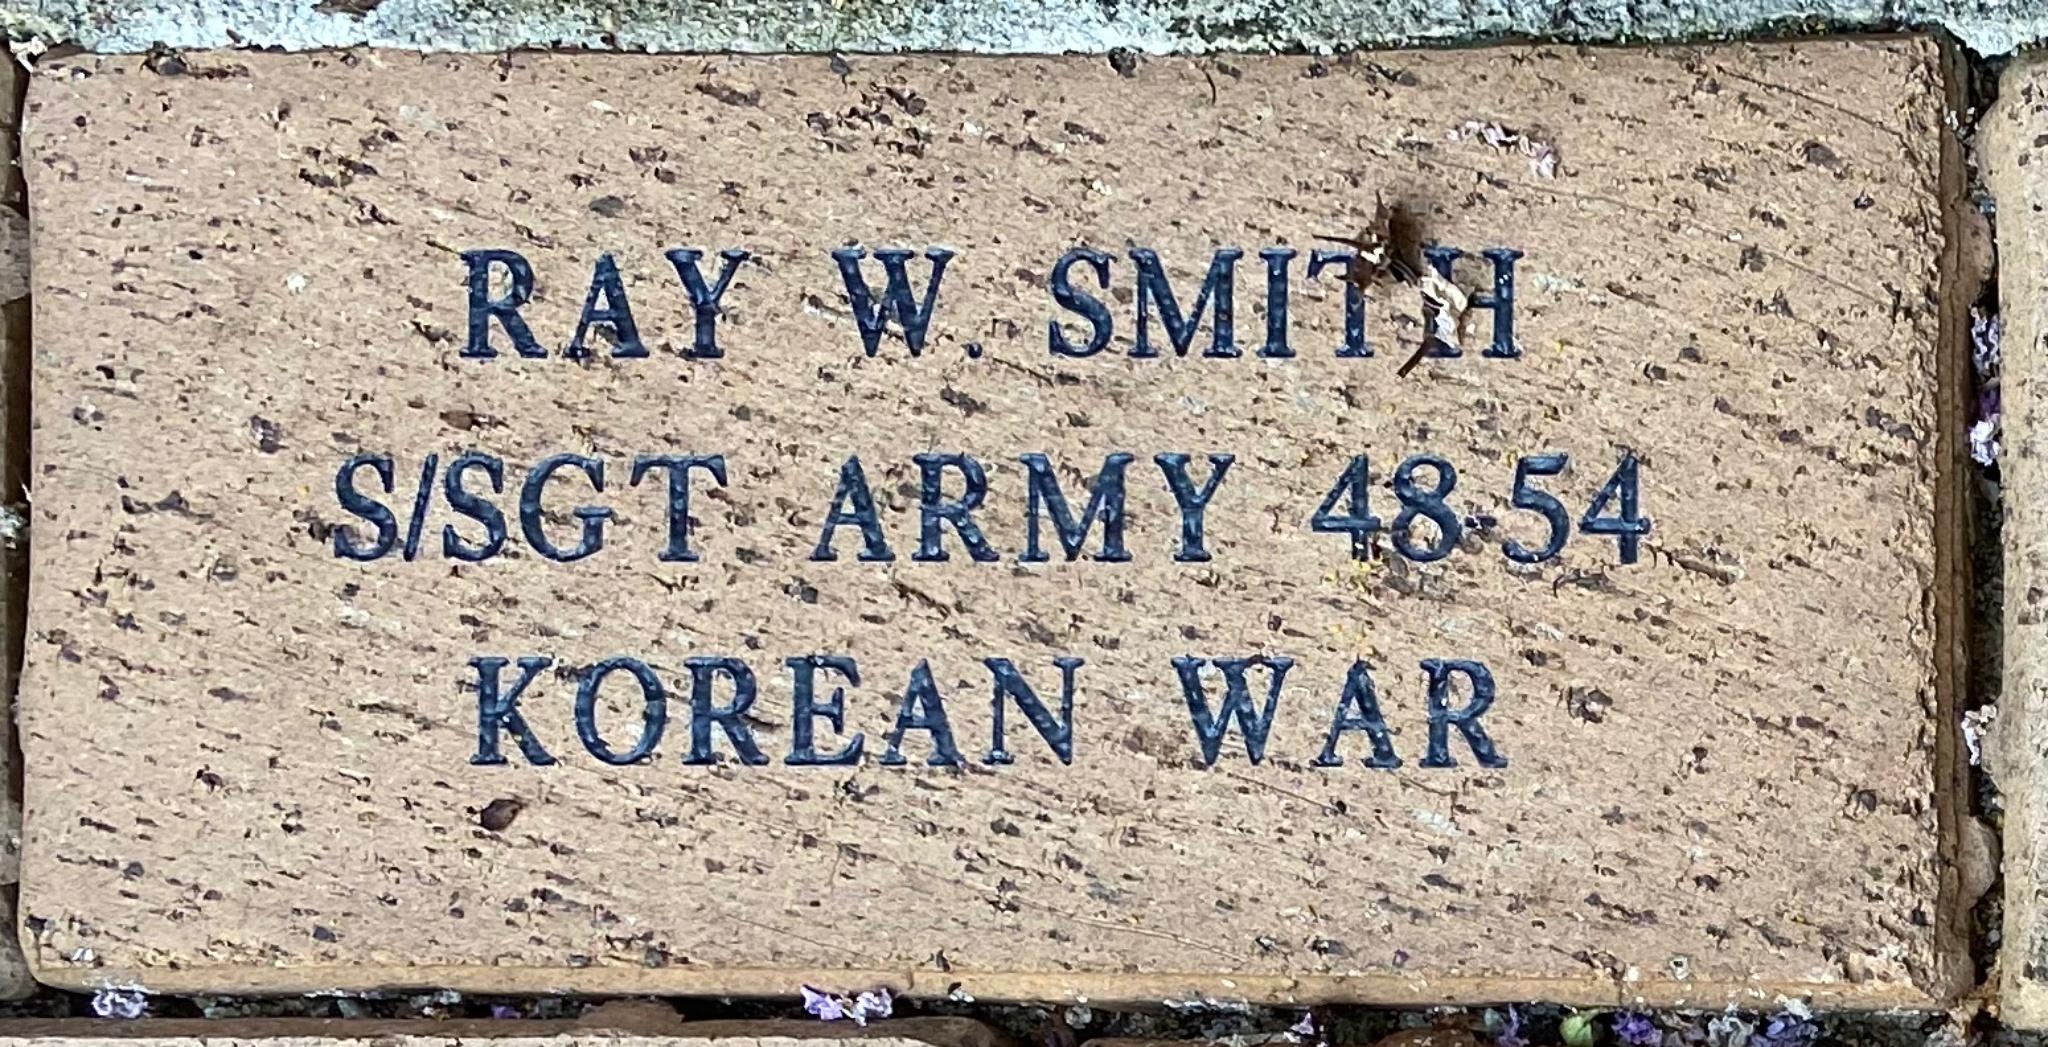 RAY W. SMITH S/SGT ARMY 48-54 KOREAN WAR